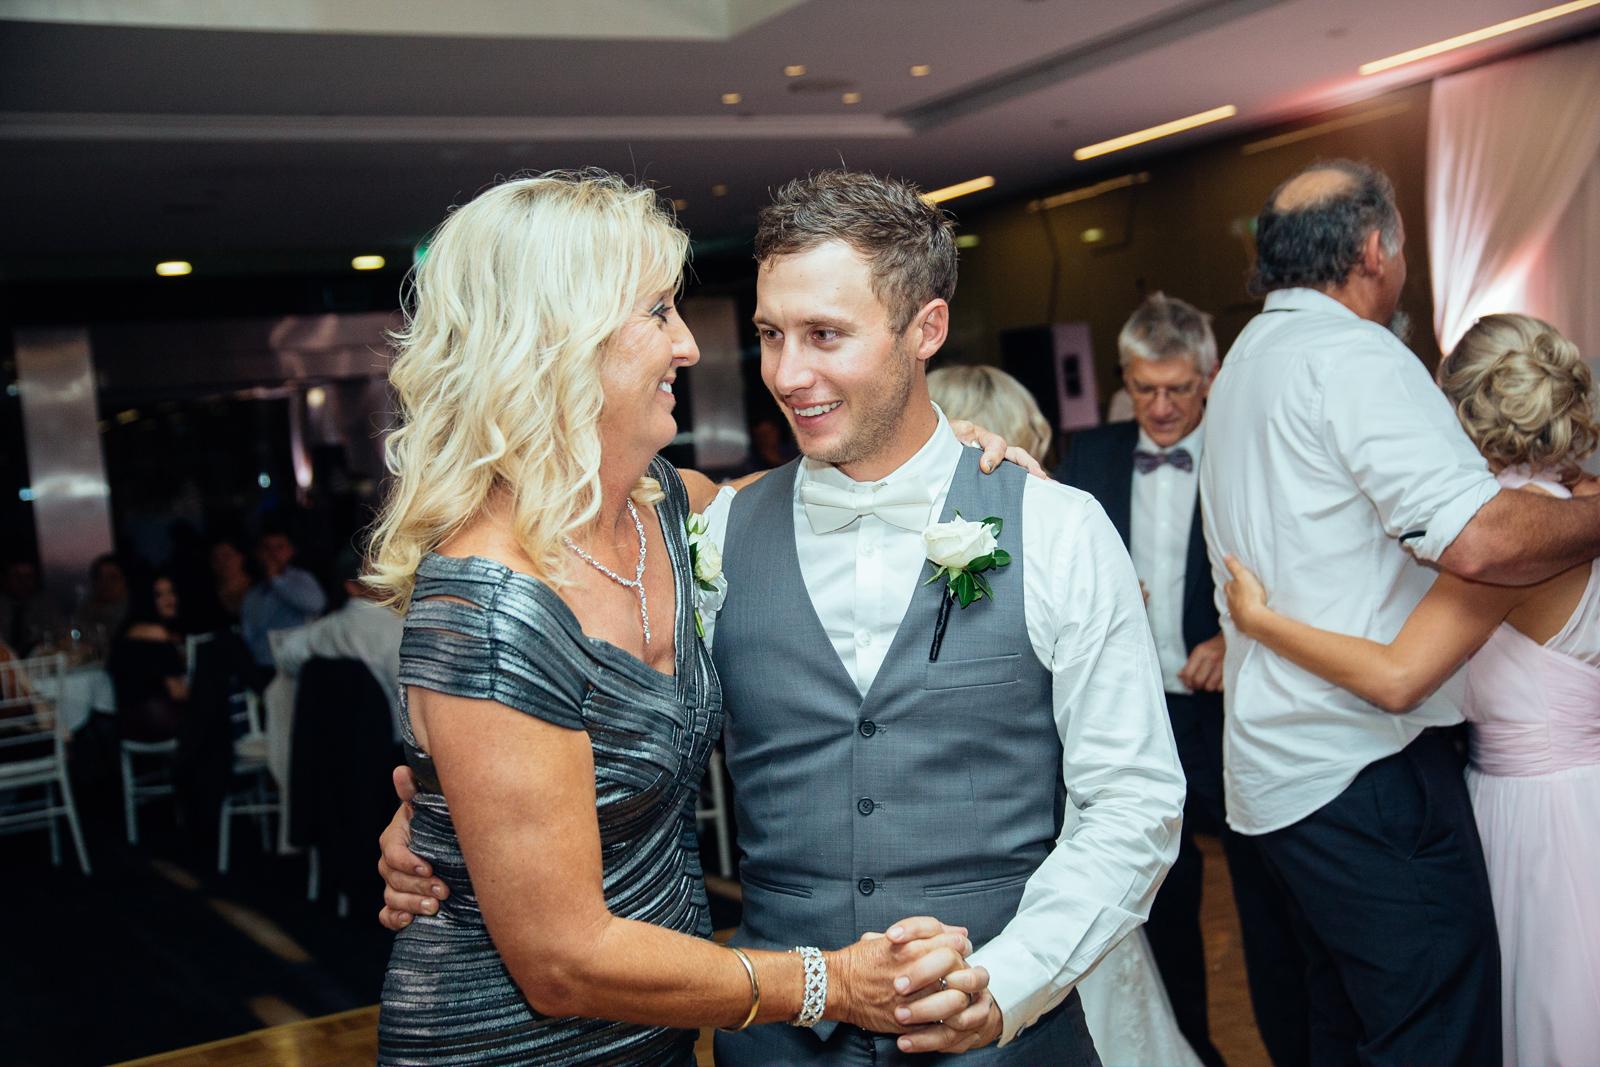 Mother/Son Royal Pines Wedding Dance